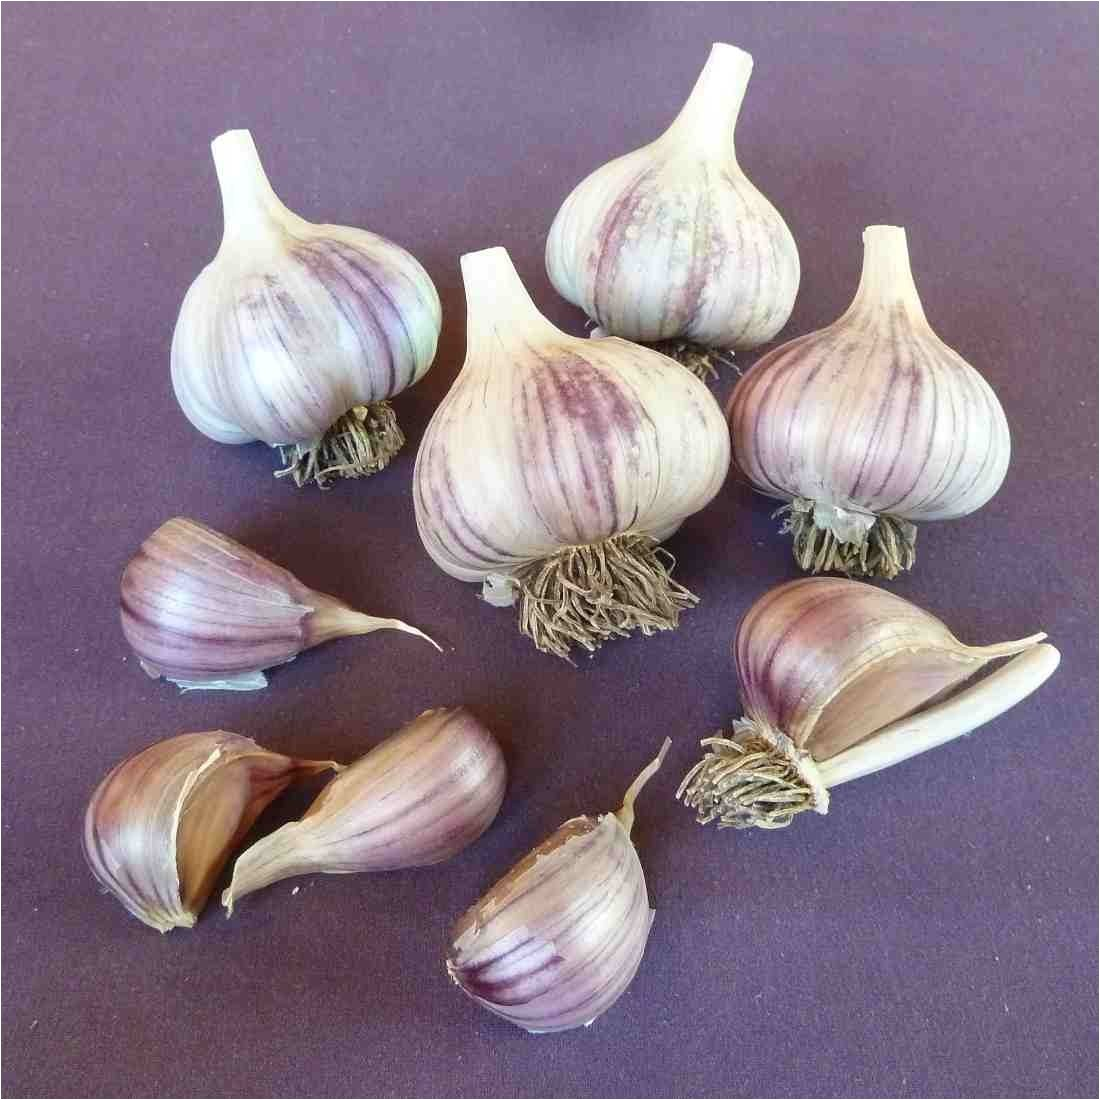 Hardneck Garlic Seed for Sale Online Store Seed Garlic for Sale Online Red Gate Garlic